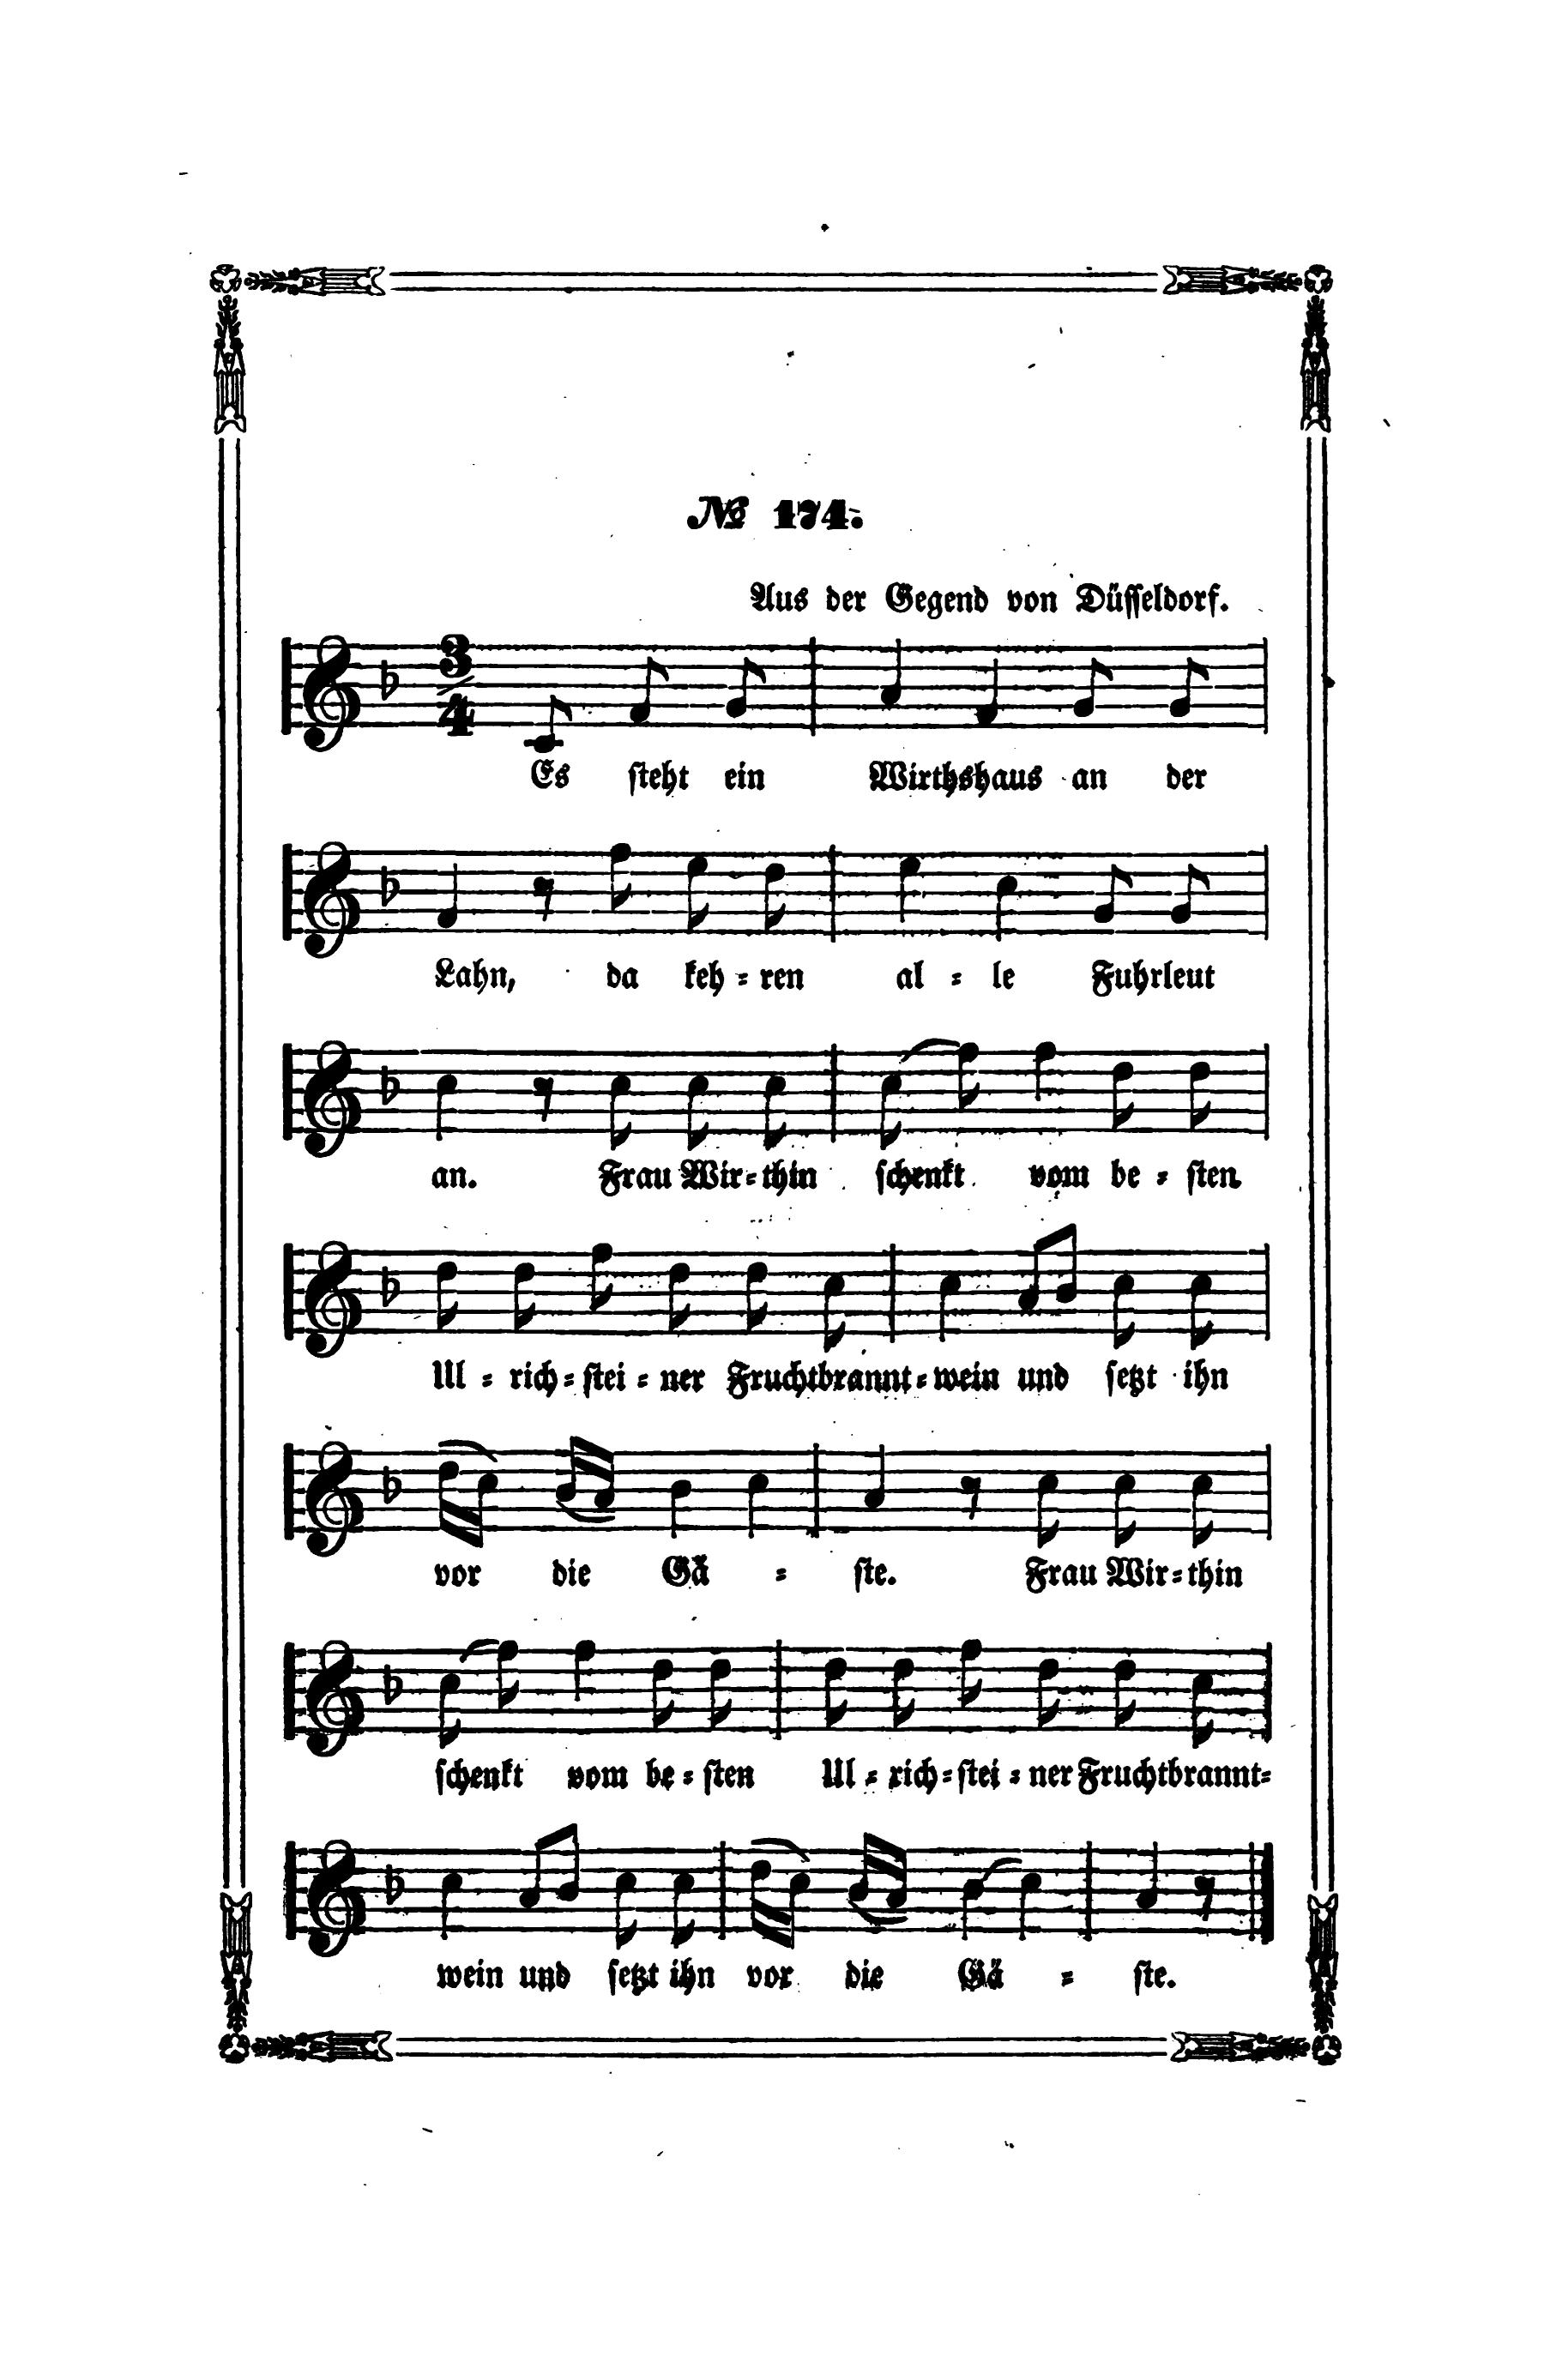 File:Deutsche Volkslieder (Kretschmer) 1 309.jpg - Wikimedia Commons